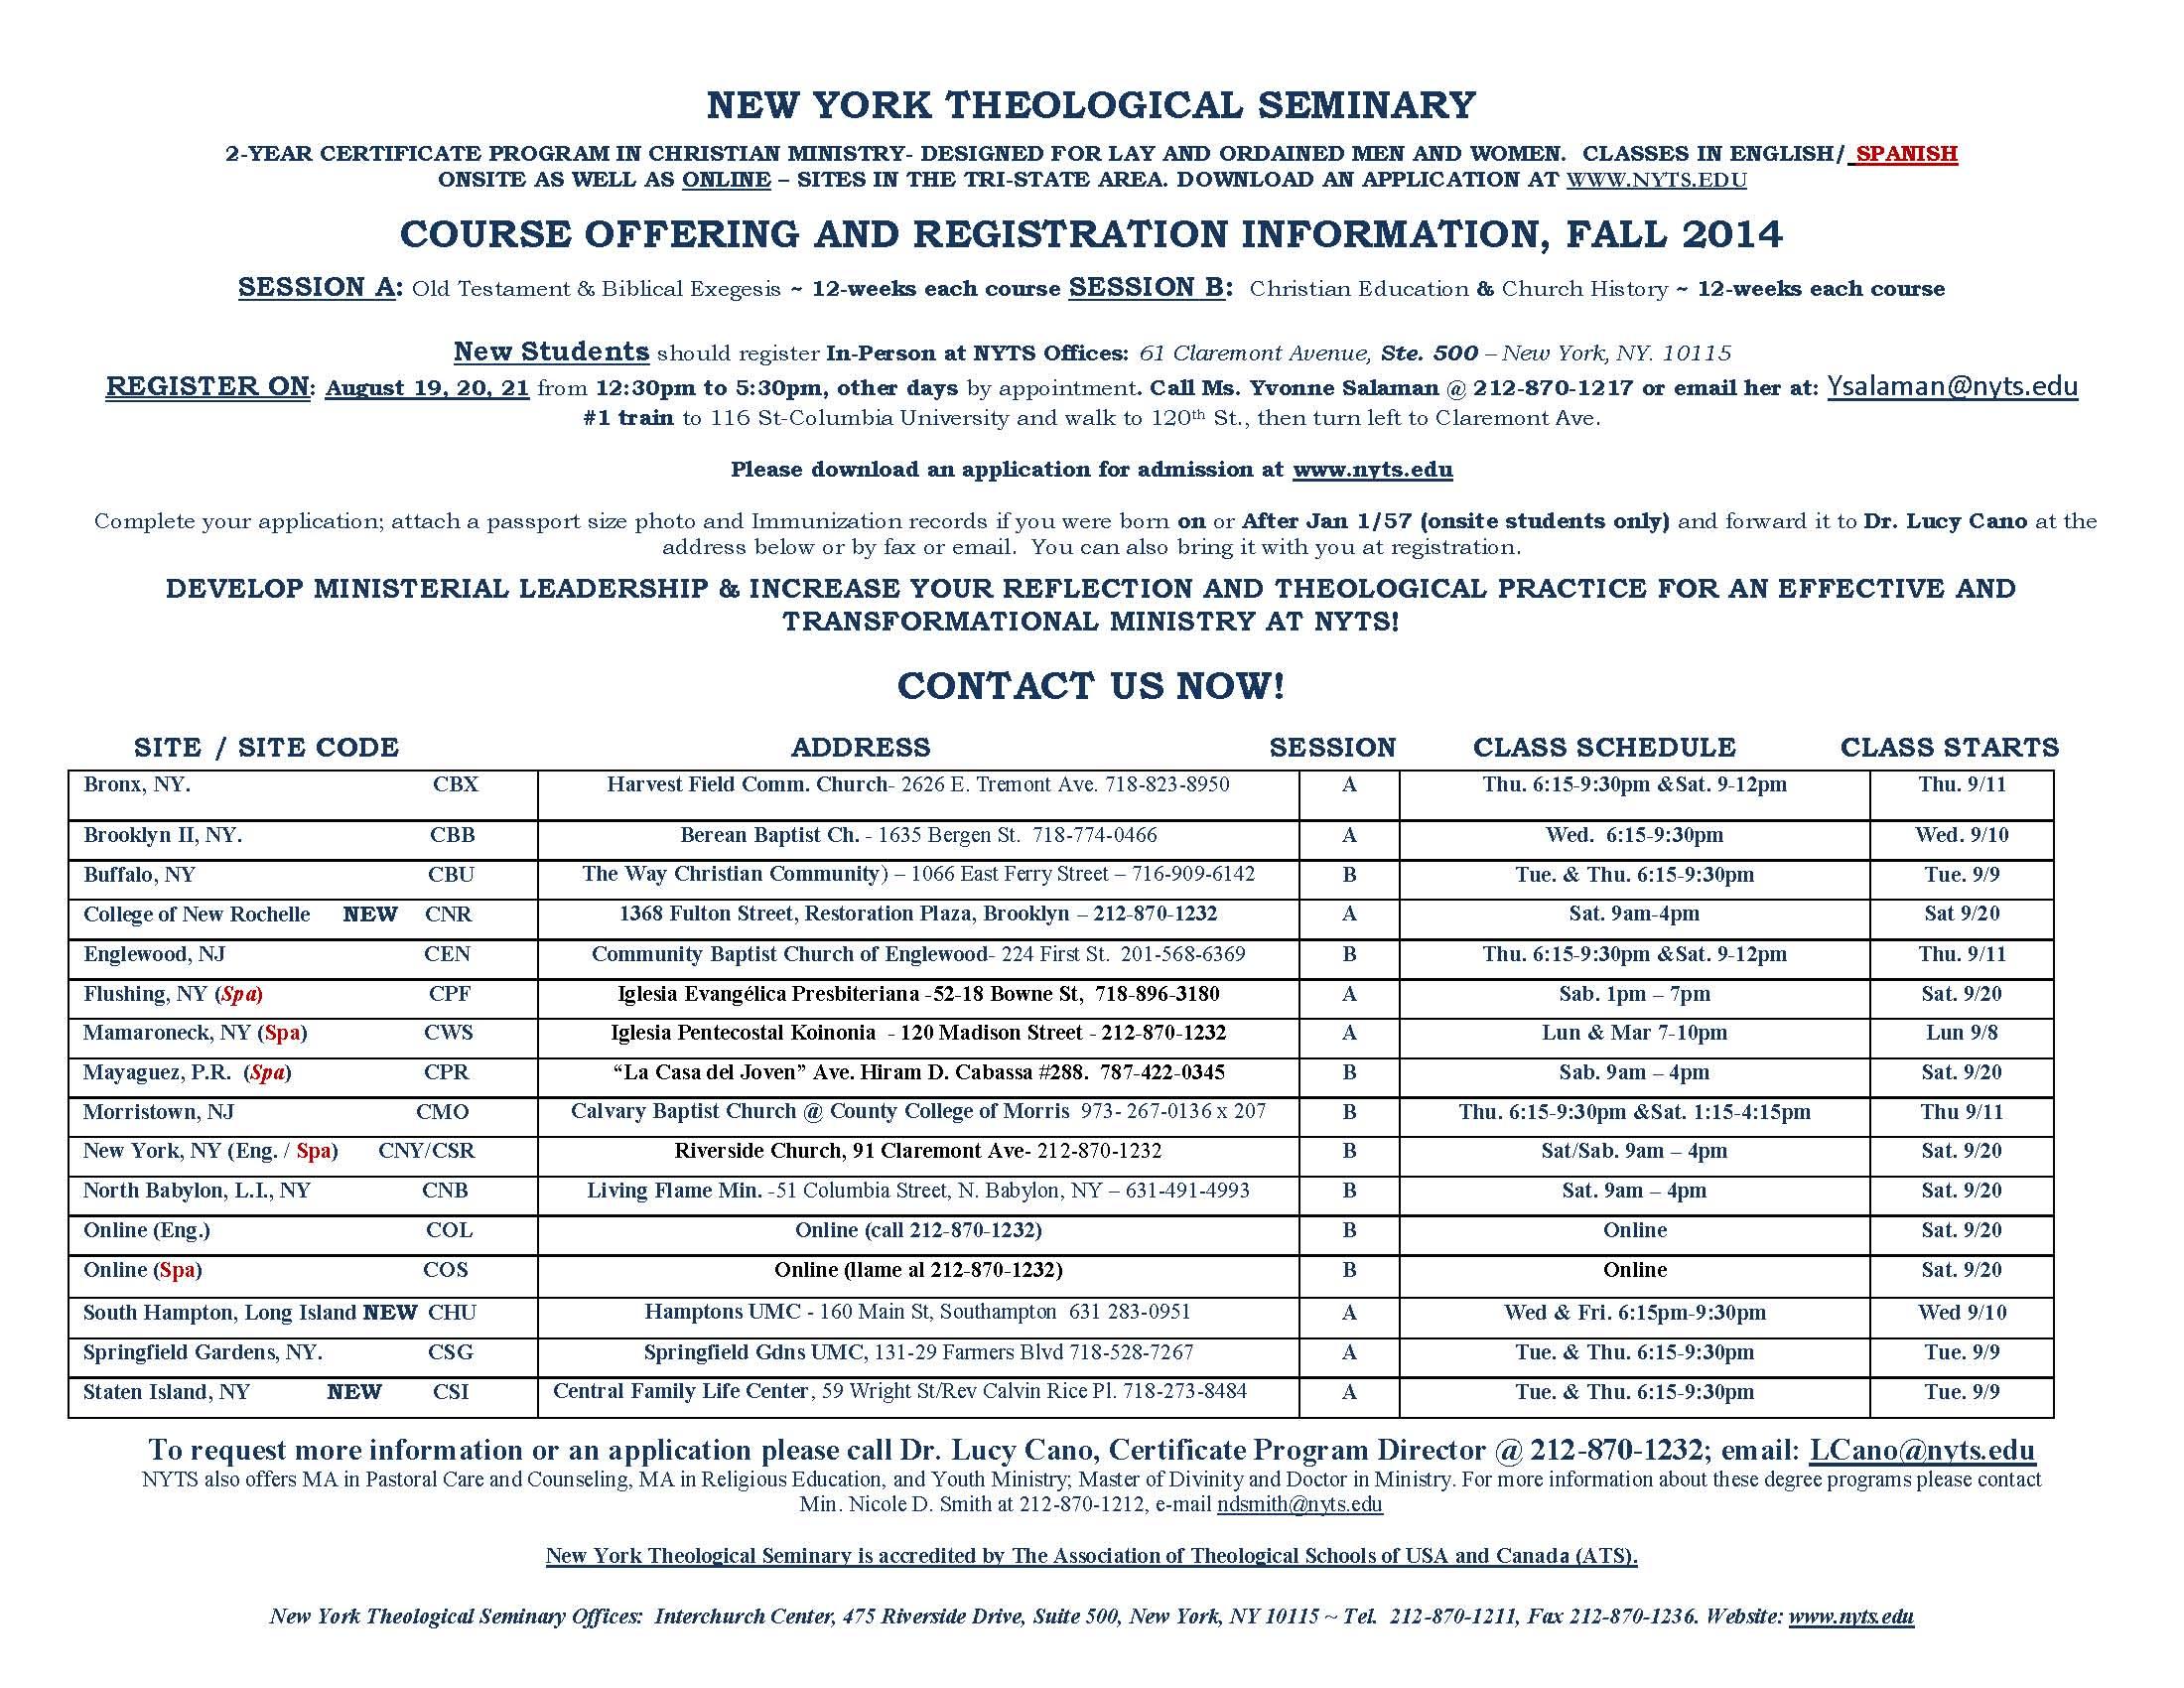 Fall 2014 CP Registration Info